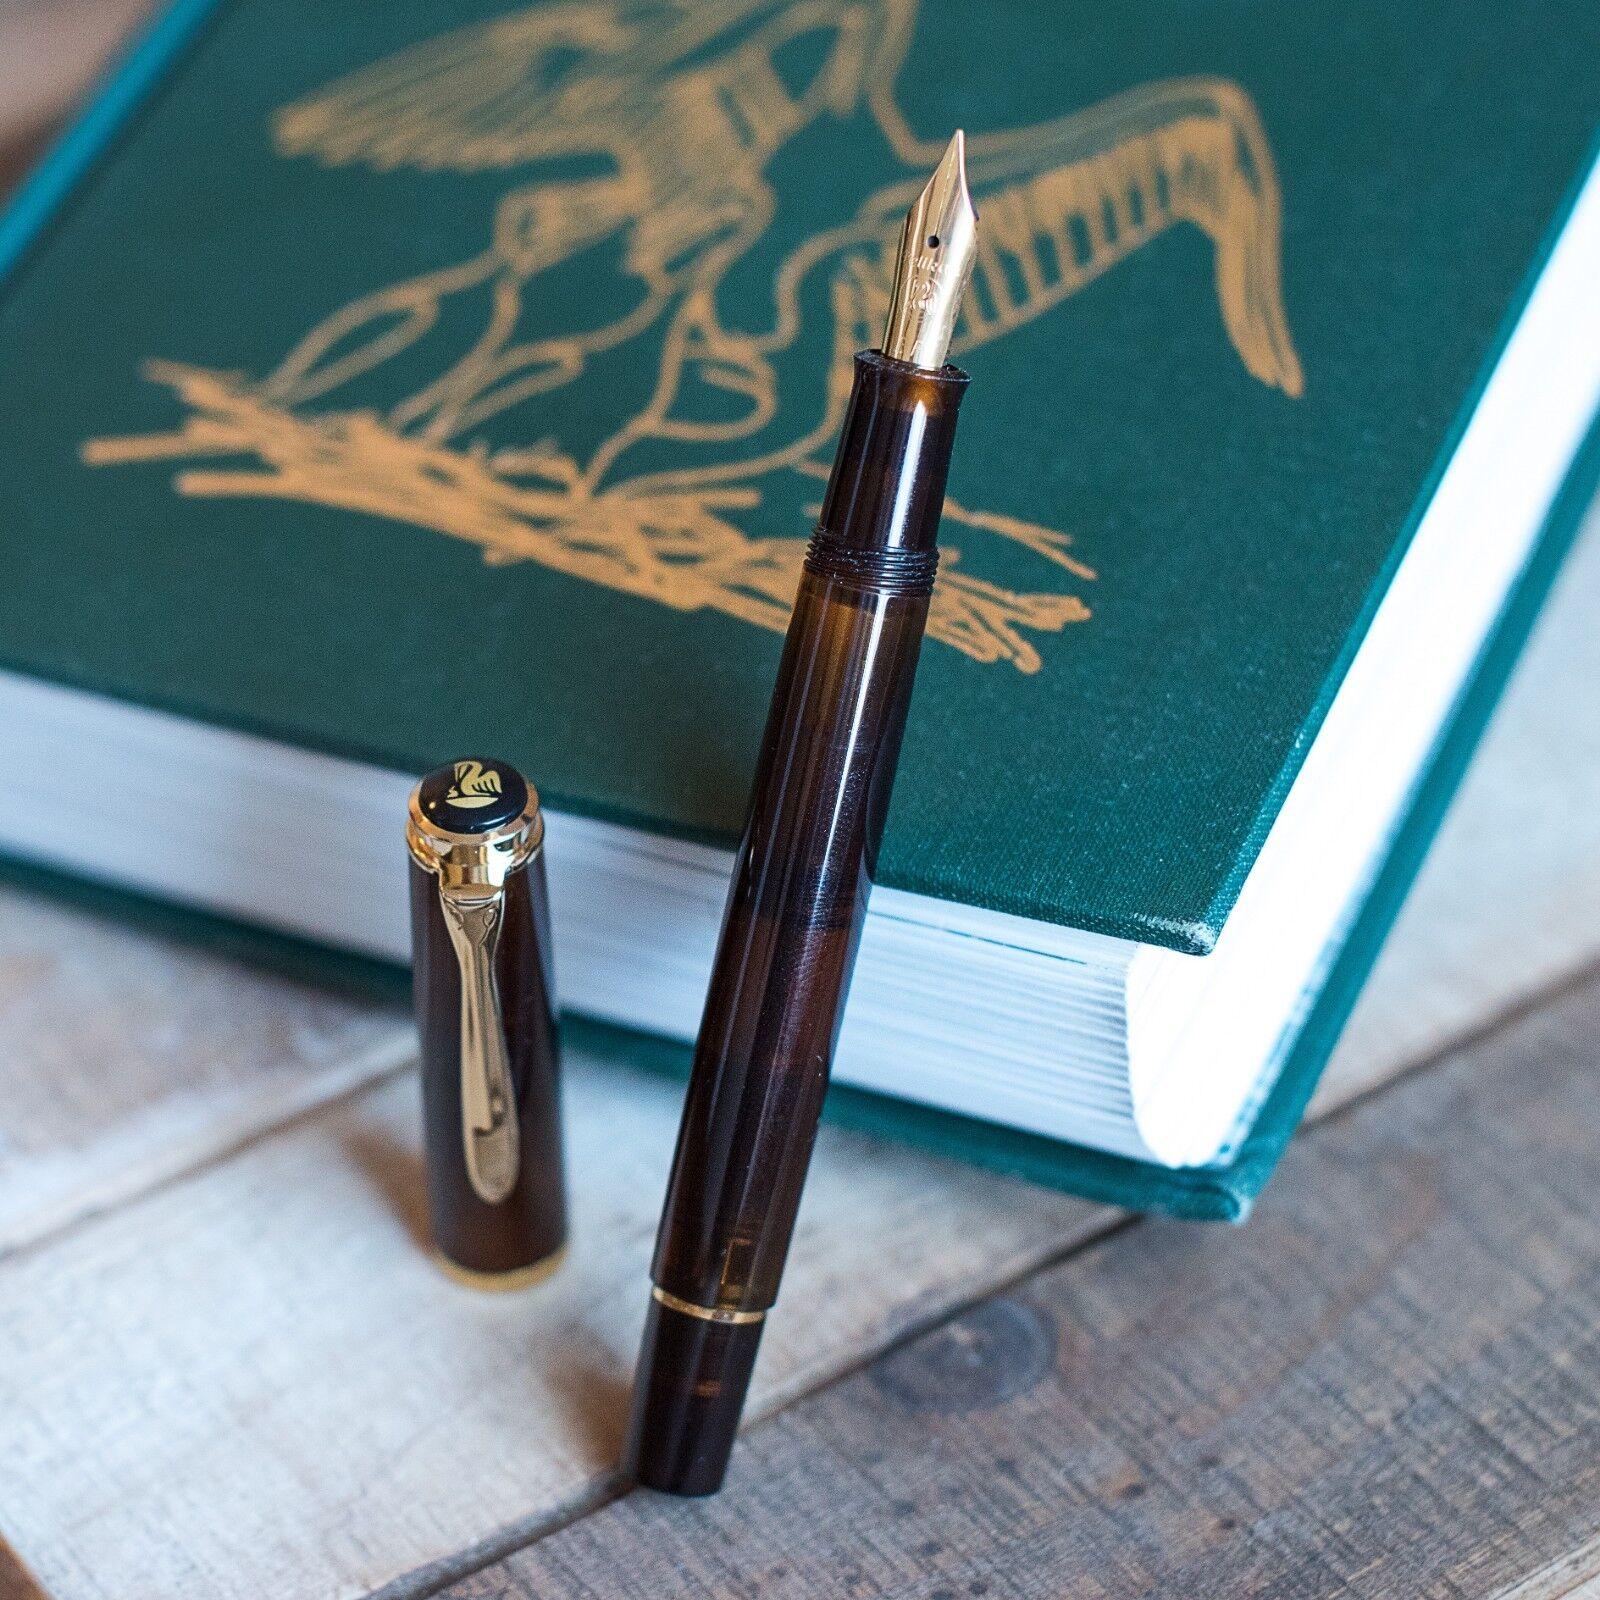 Pelikan Classic M200 Fountain Pen Smoky Quartz Demonstrator Medium Point 805155